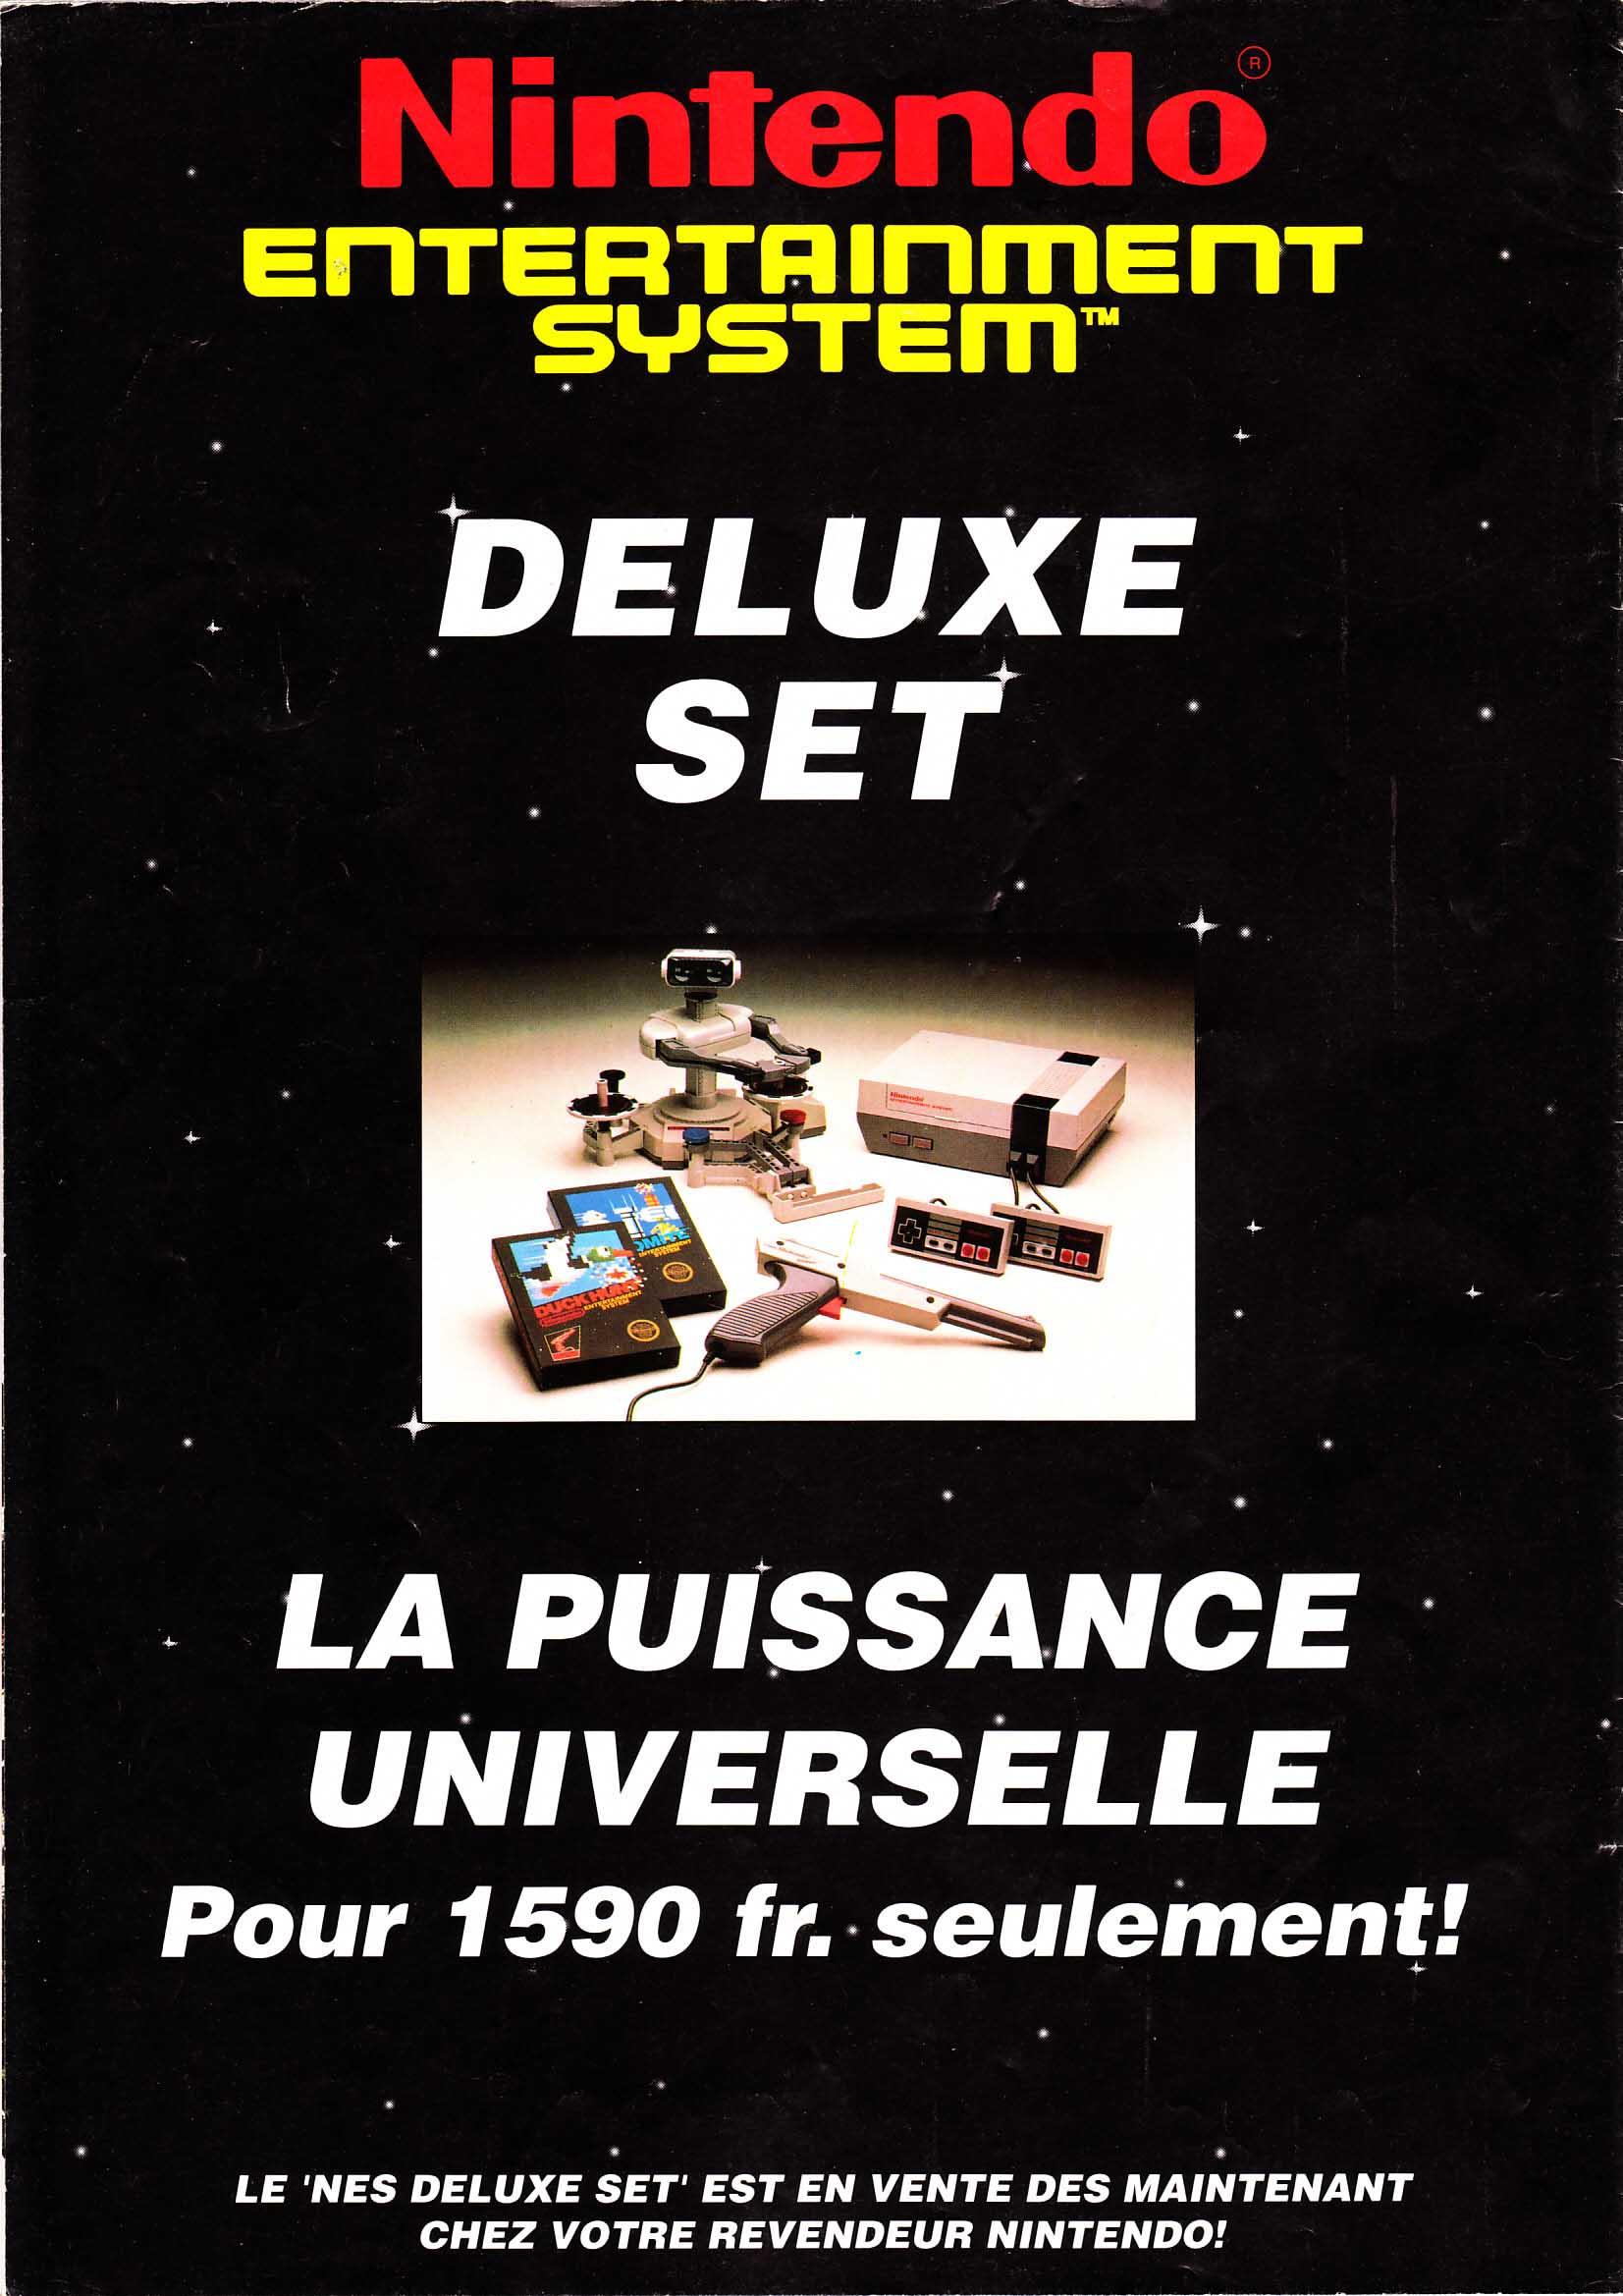 Vu sur leboncoin.fr .. Club%20nintendo%20-%20Num2_ed1989_p_0020